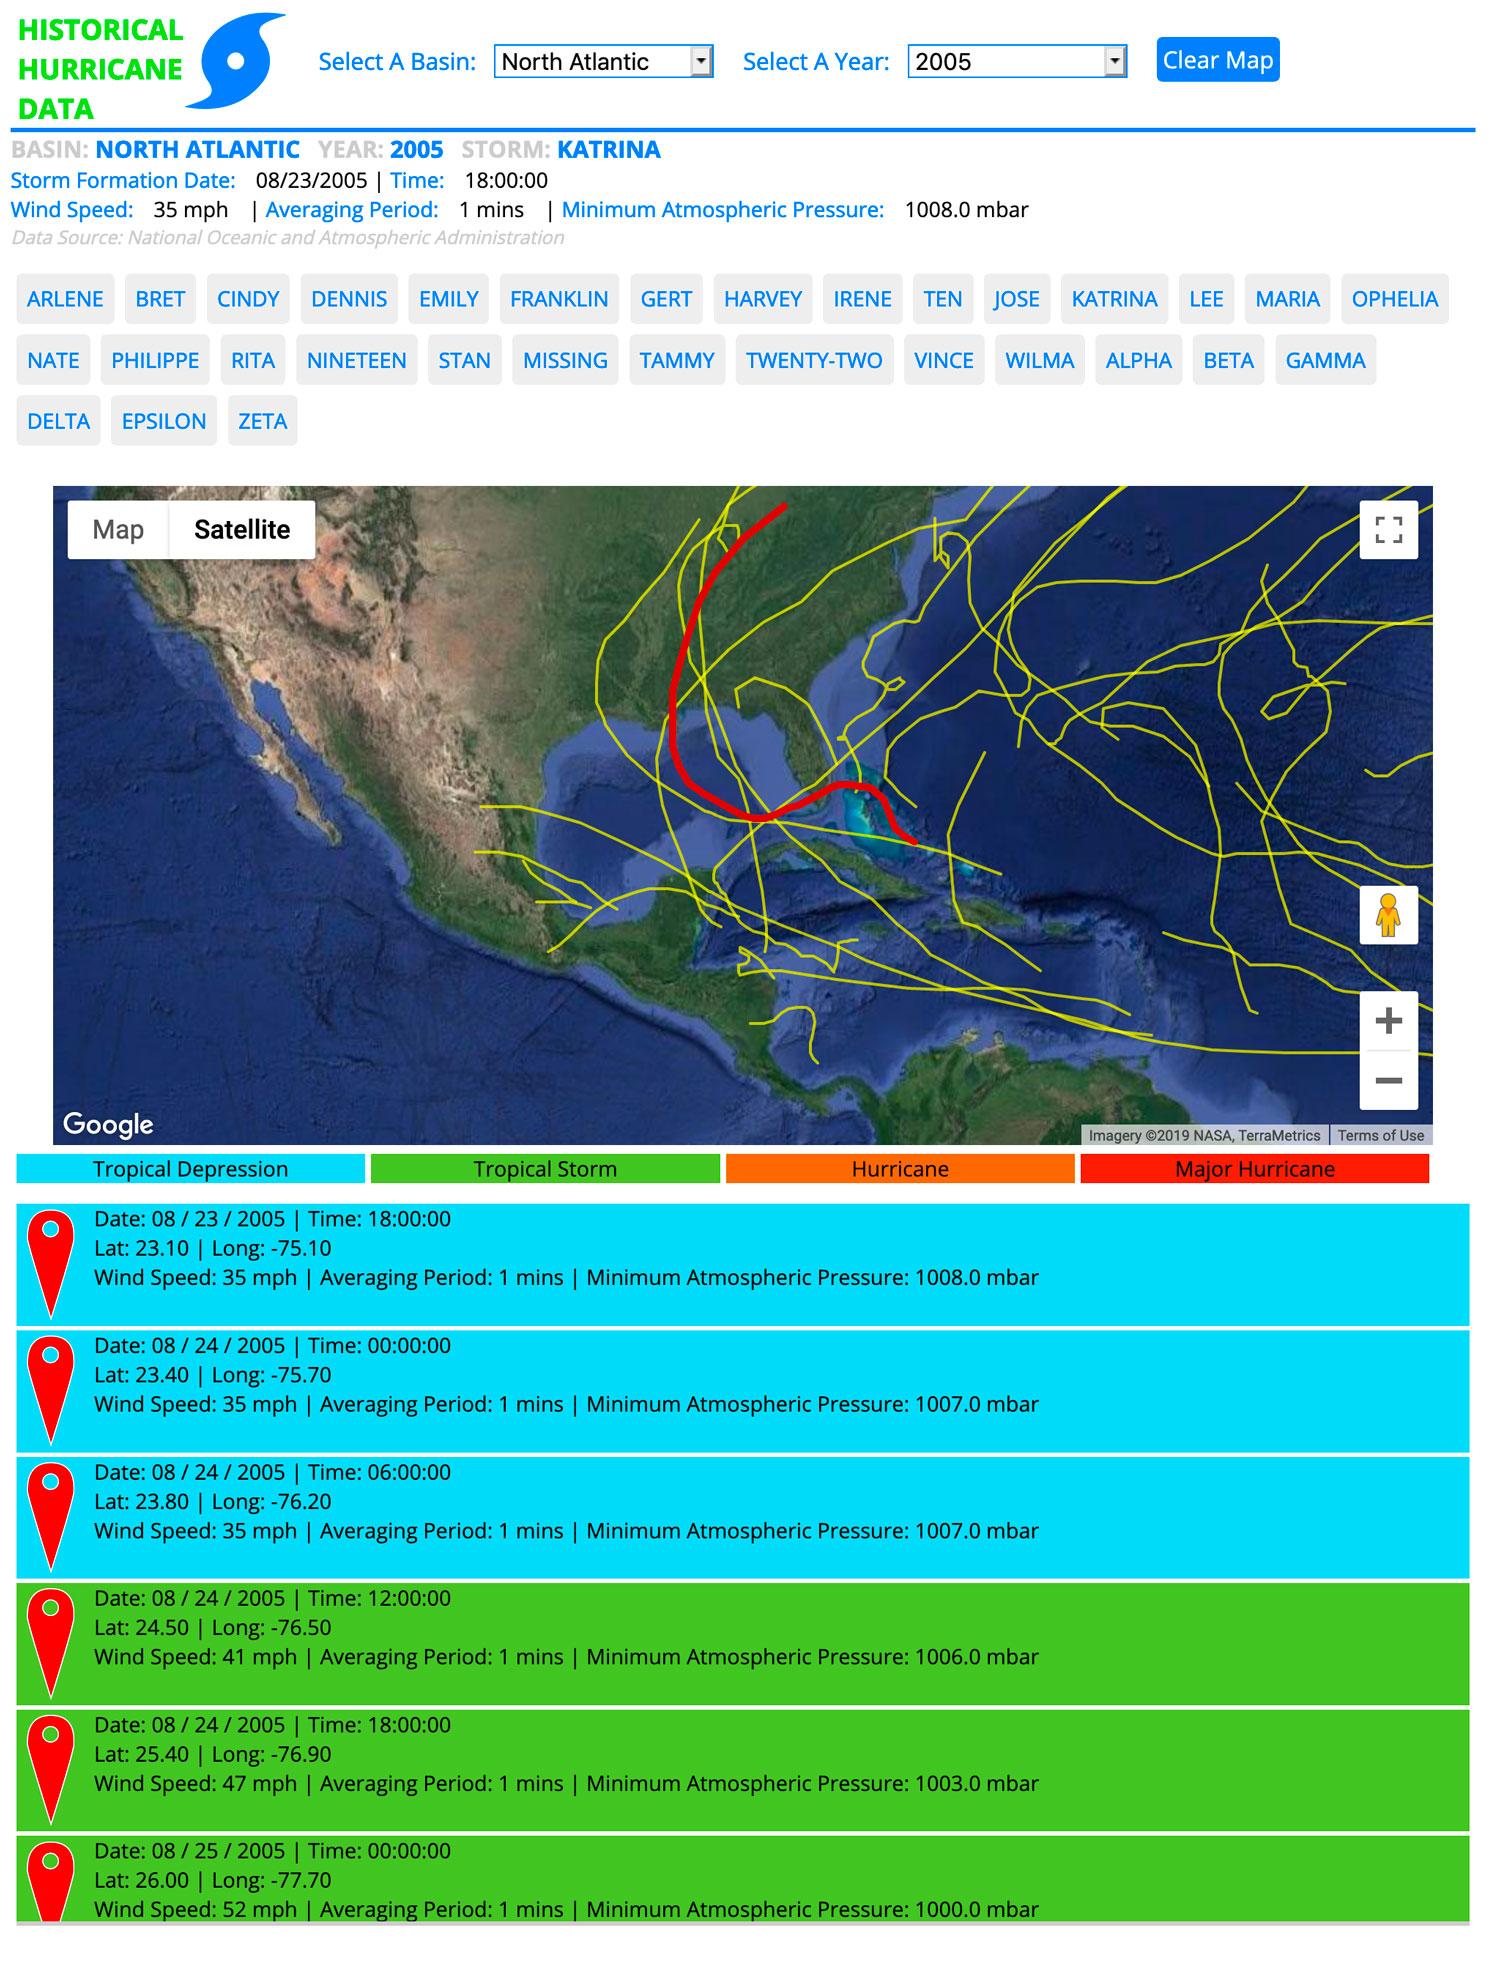 Current sceenshot of the Hurricane Tracker